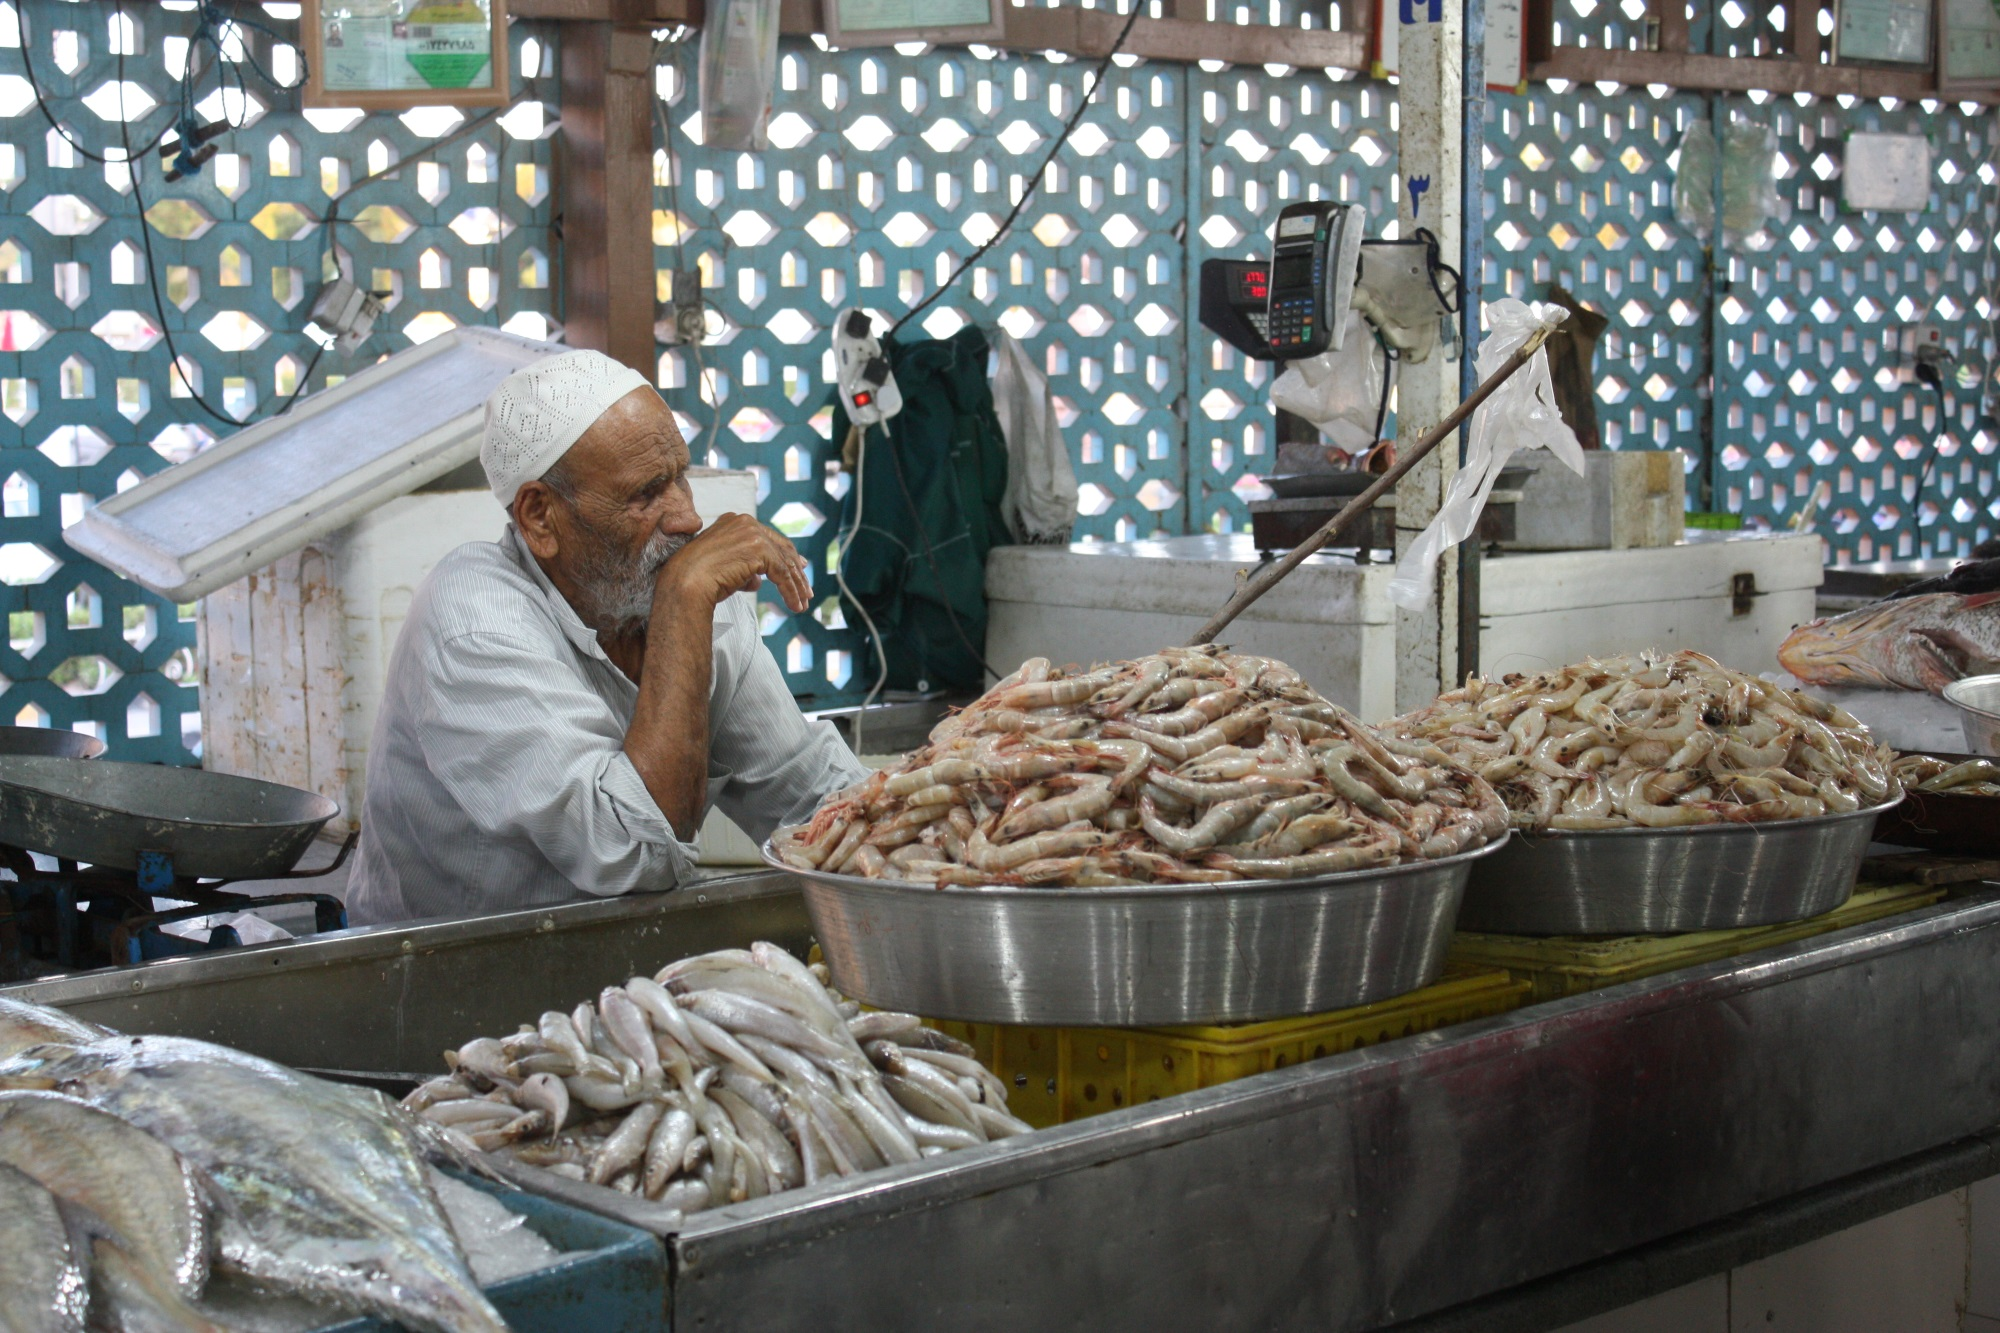 iran-bandar-abbas-fish-market_o-randin-c899d25c33aa6e394cea70a9425dde4711bb47e6